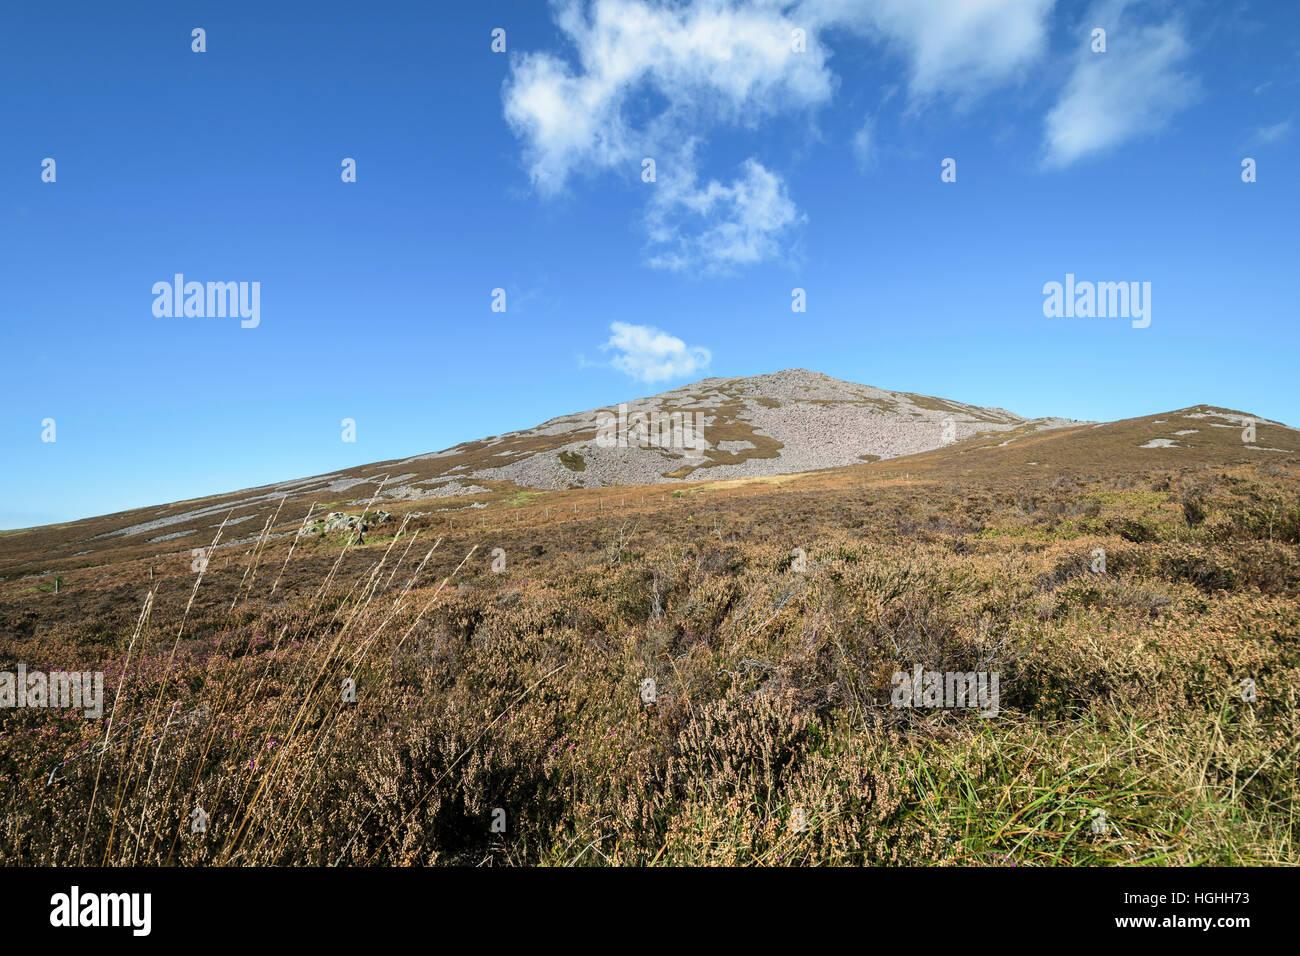 Yr Eifl (The Rivals) viewed from the Llyn coastal path on the Lleyn Peninsula North Wales UK - Stock Image